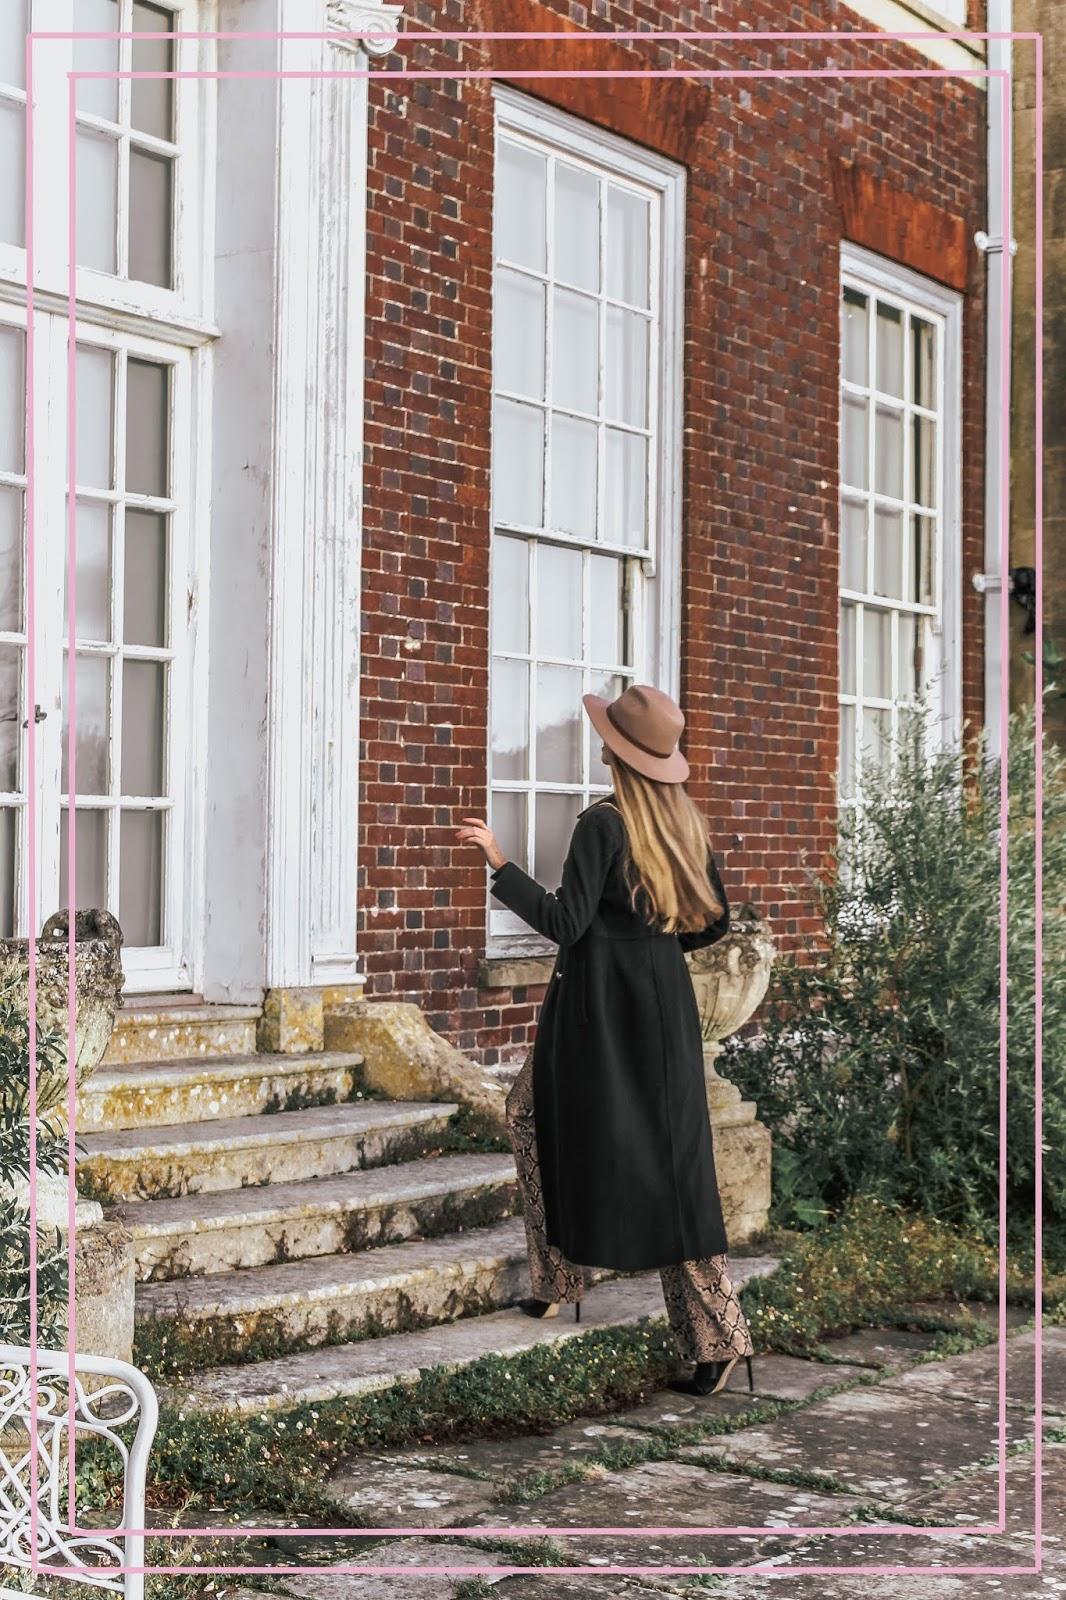 Walking into British Manor House